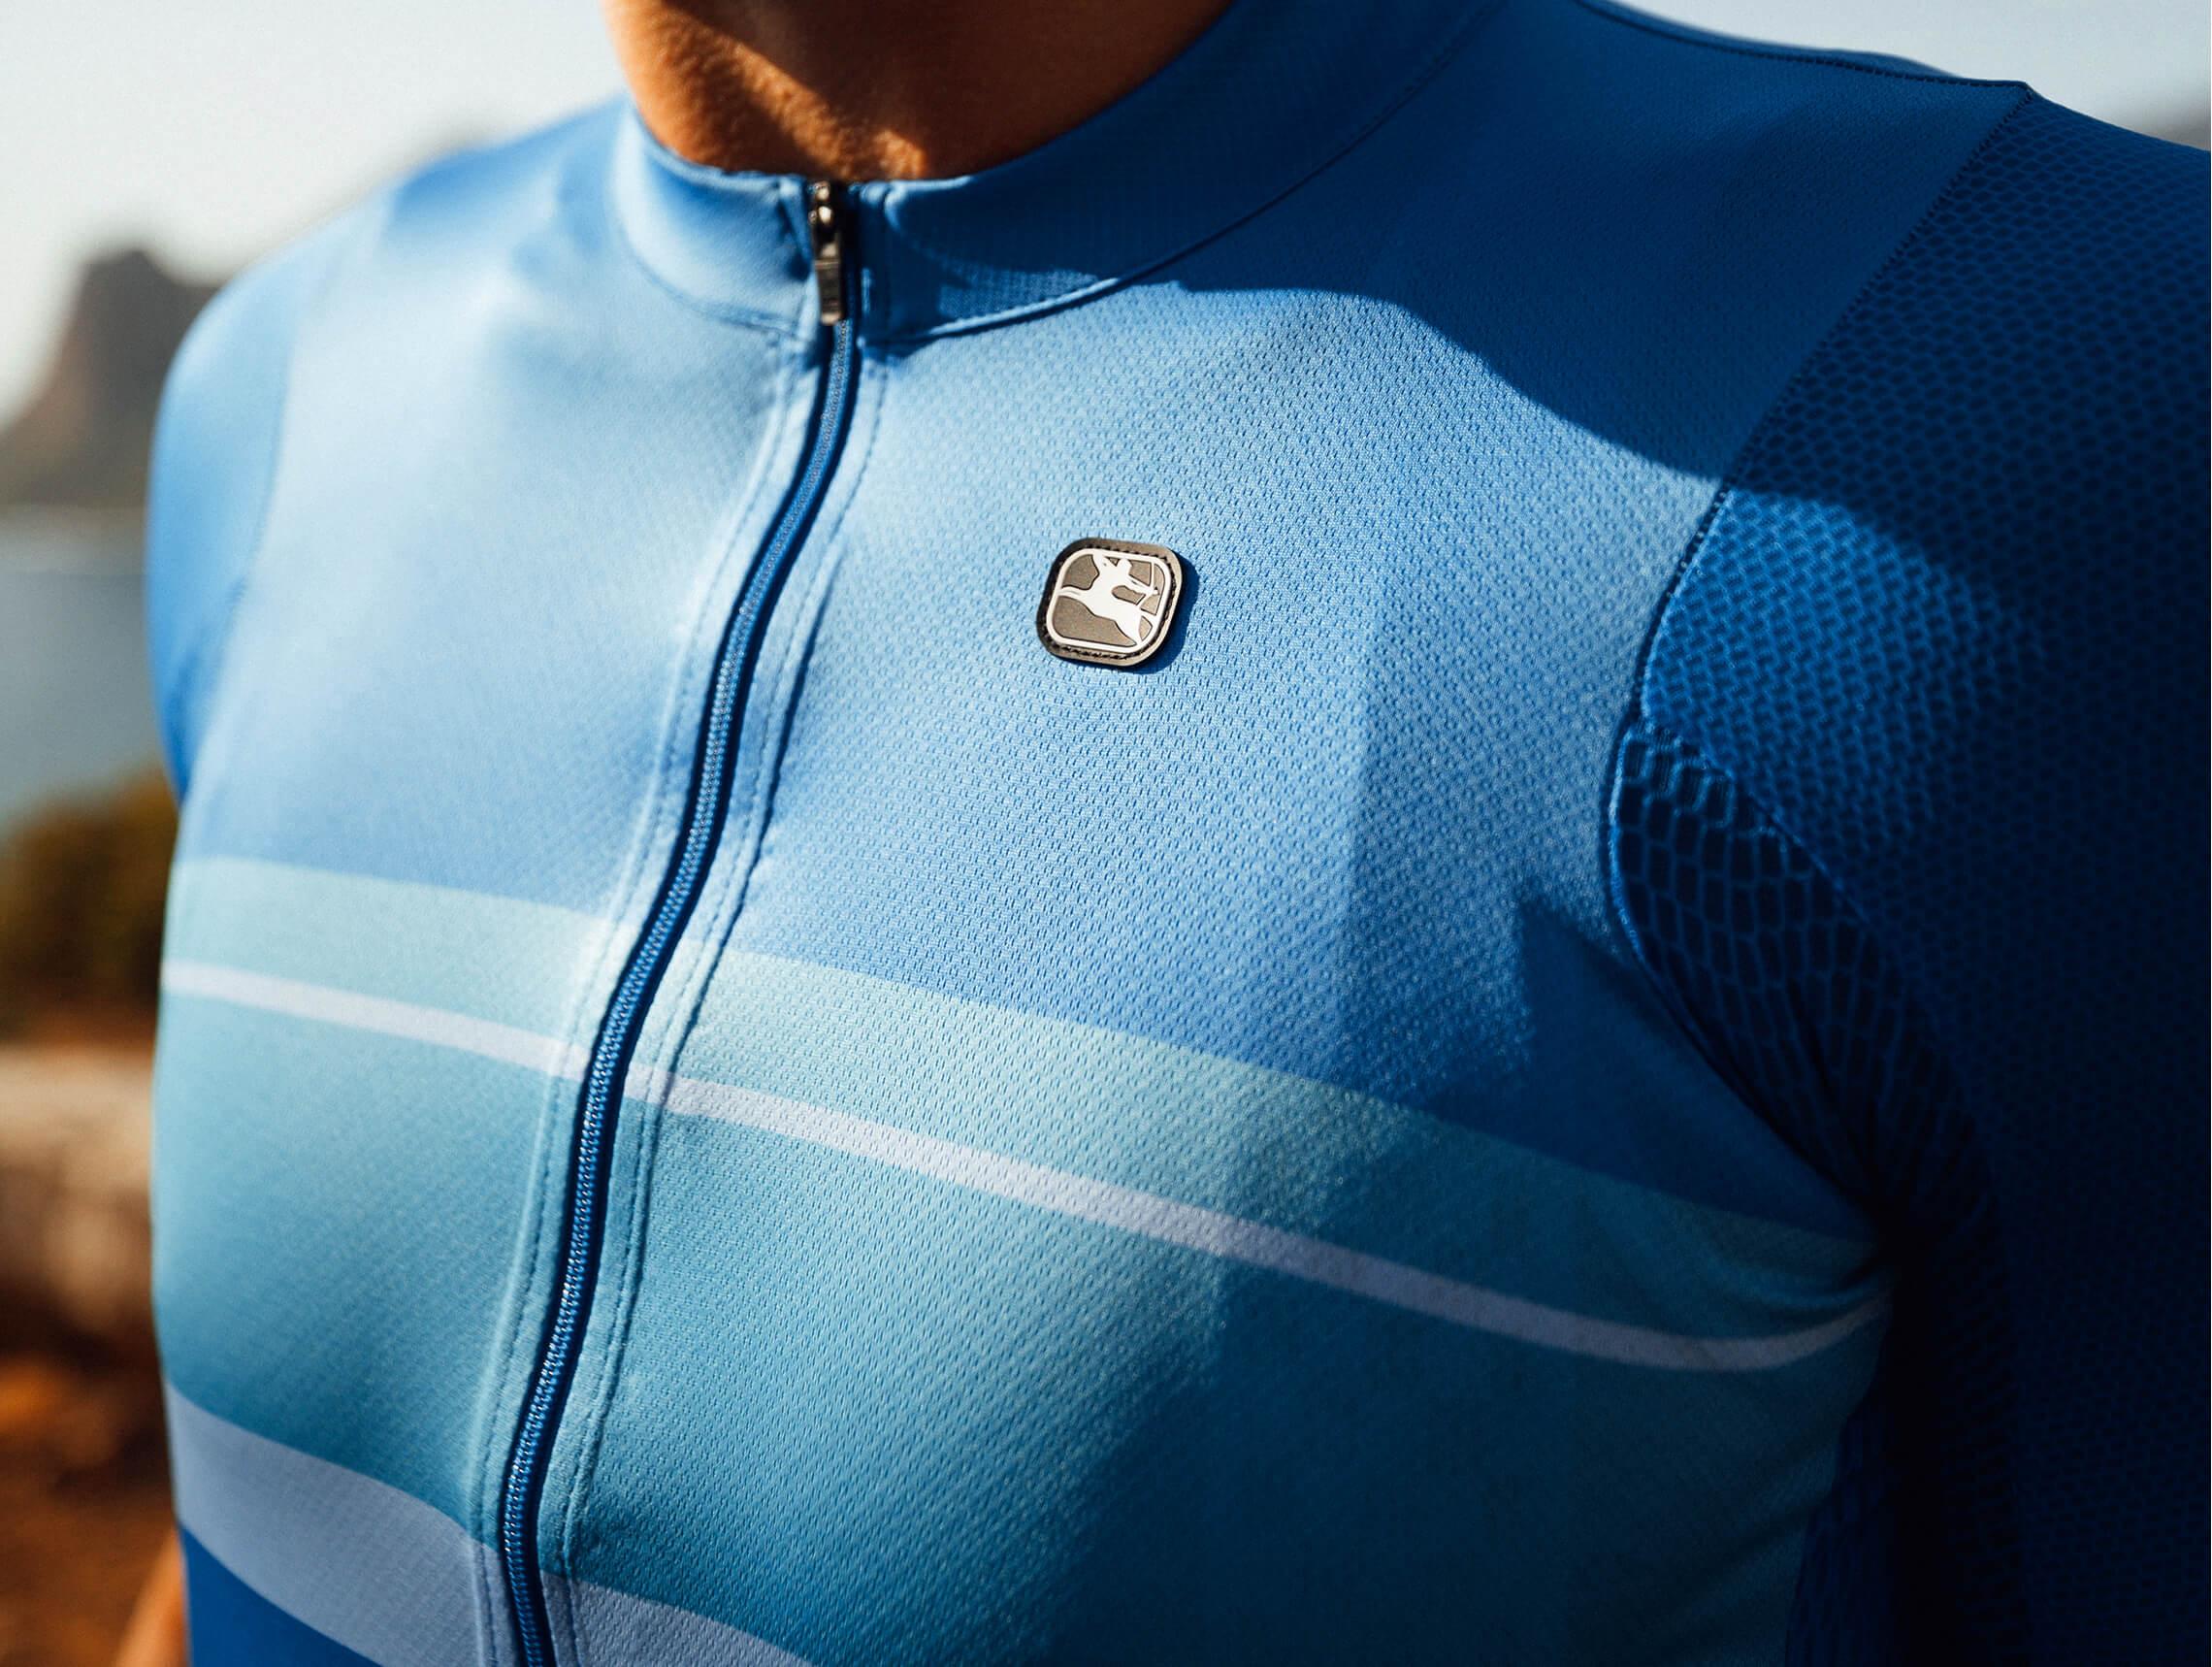 giordana-cycling-ss21-jersey-guide-men-nx-g-1